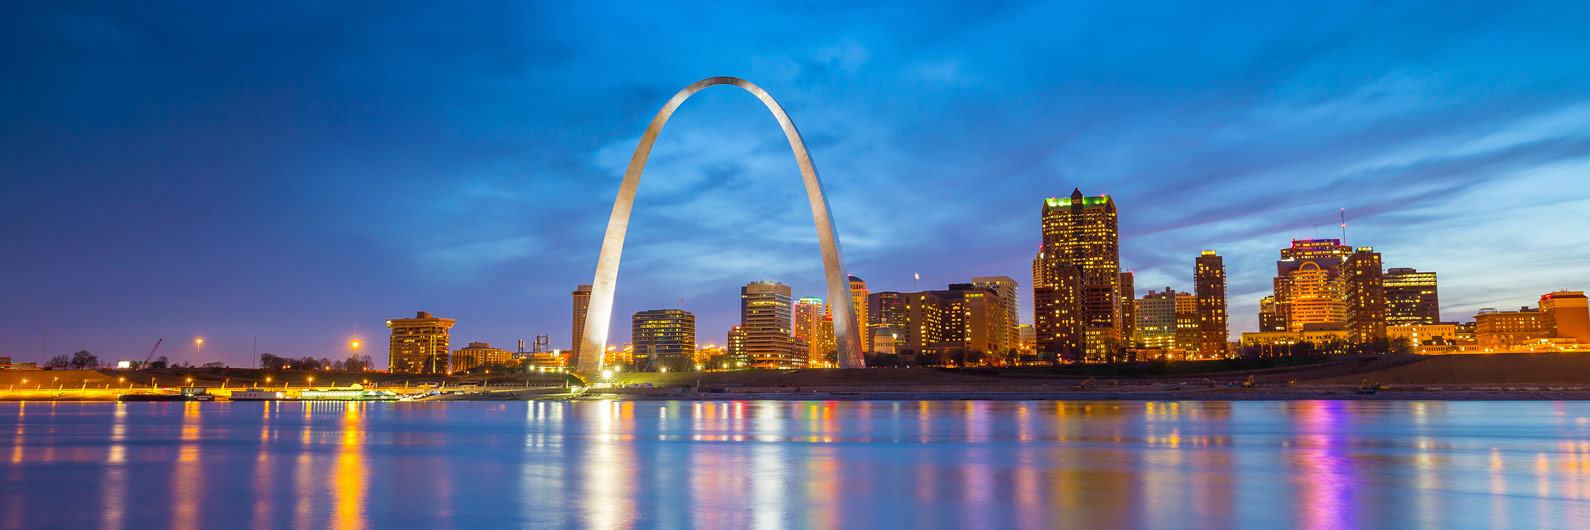 Mejores zonas donde alojarse en St. Louis, Missouri